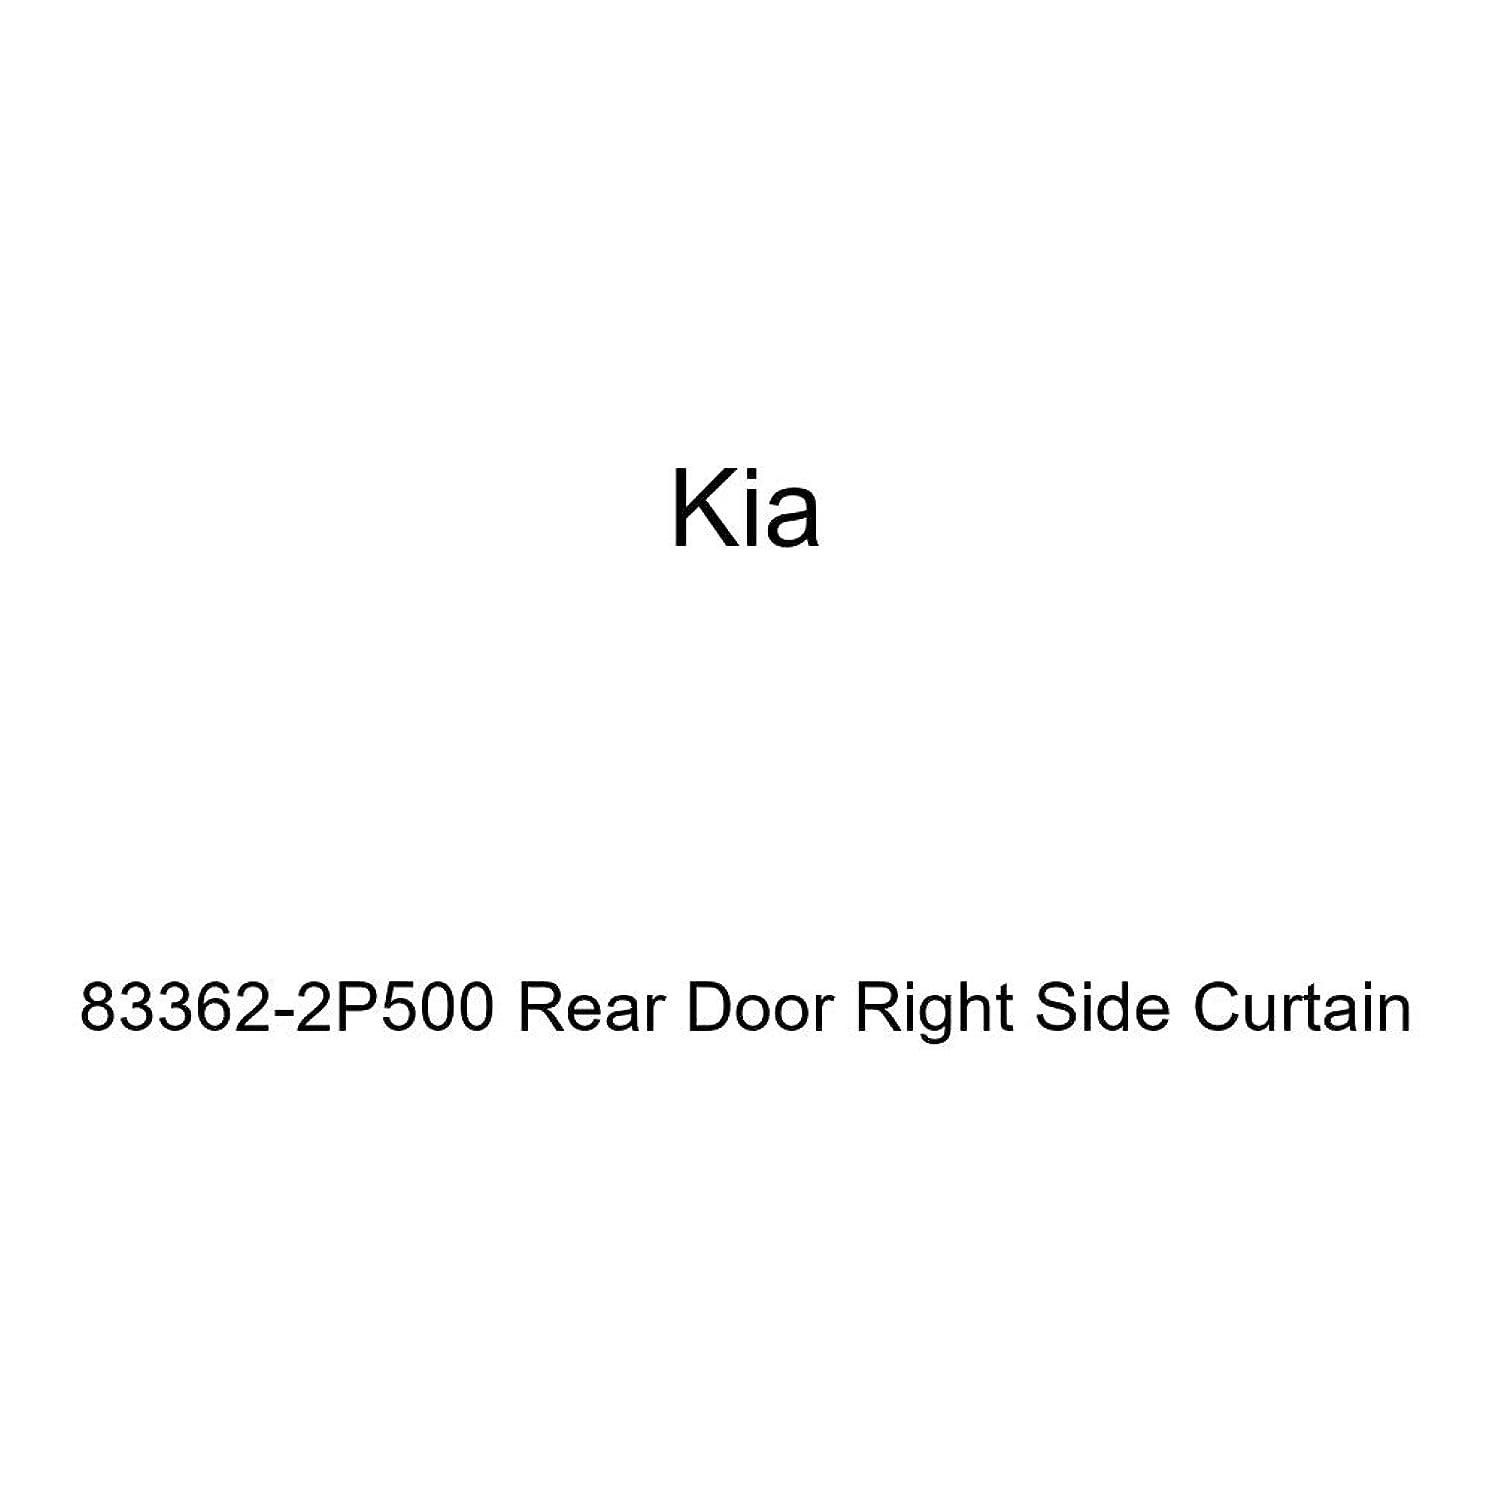 Genuine Kia 83362-2P500 Rear Door Right Side Curtain